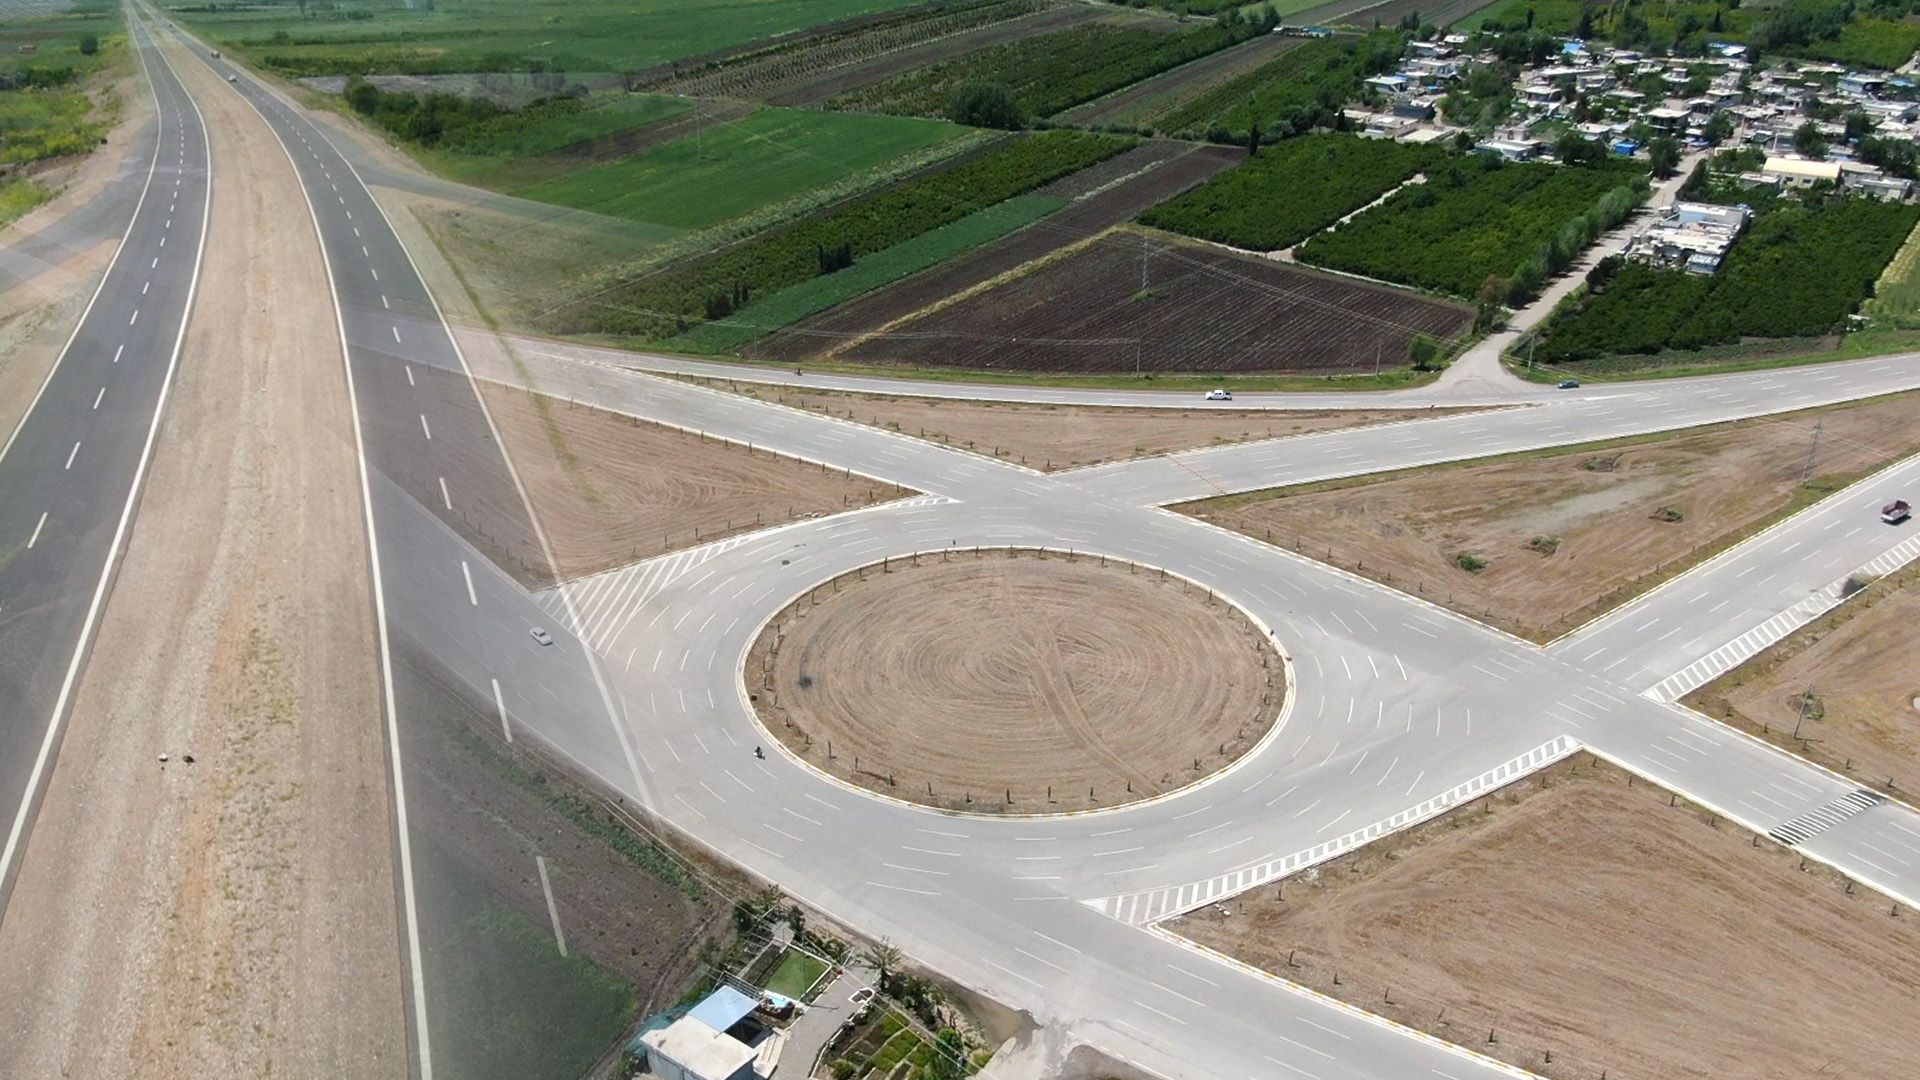 Construction of Said Sadiq Halabja Road and Renovation of Carriageway and Zalm Bridge